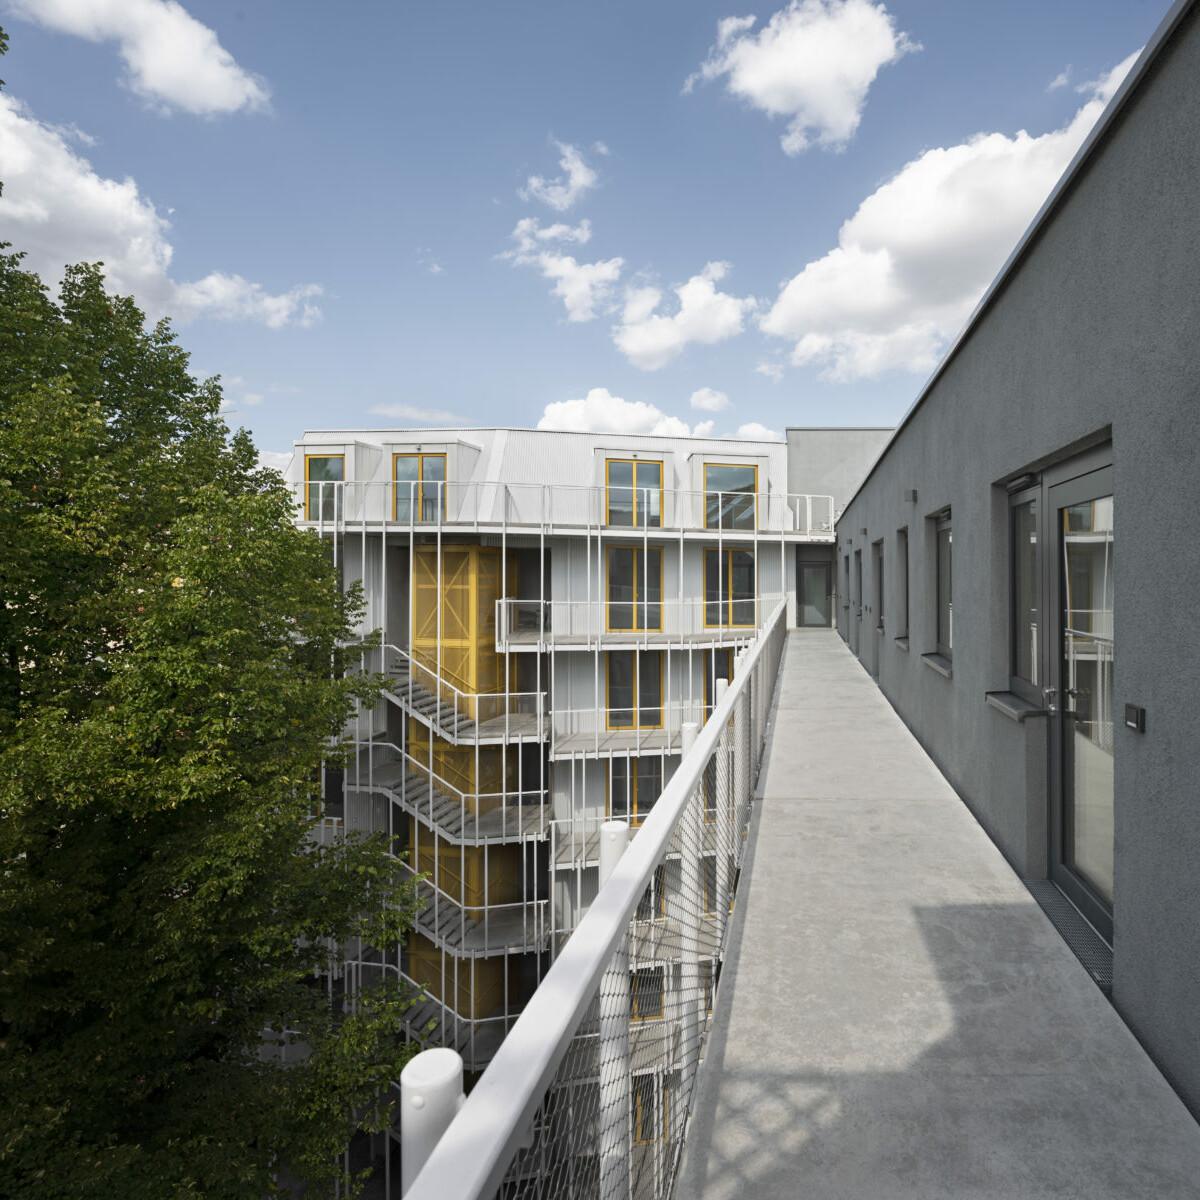 Wohnhaus Eisberg_holz-Hybrid_Berlin-Moabit_brandschutz plus eberl-pacan brandschutzplaner_Foto Gui Rebelo_Hofansicht